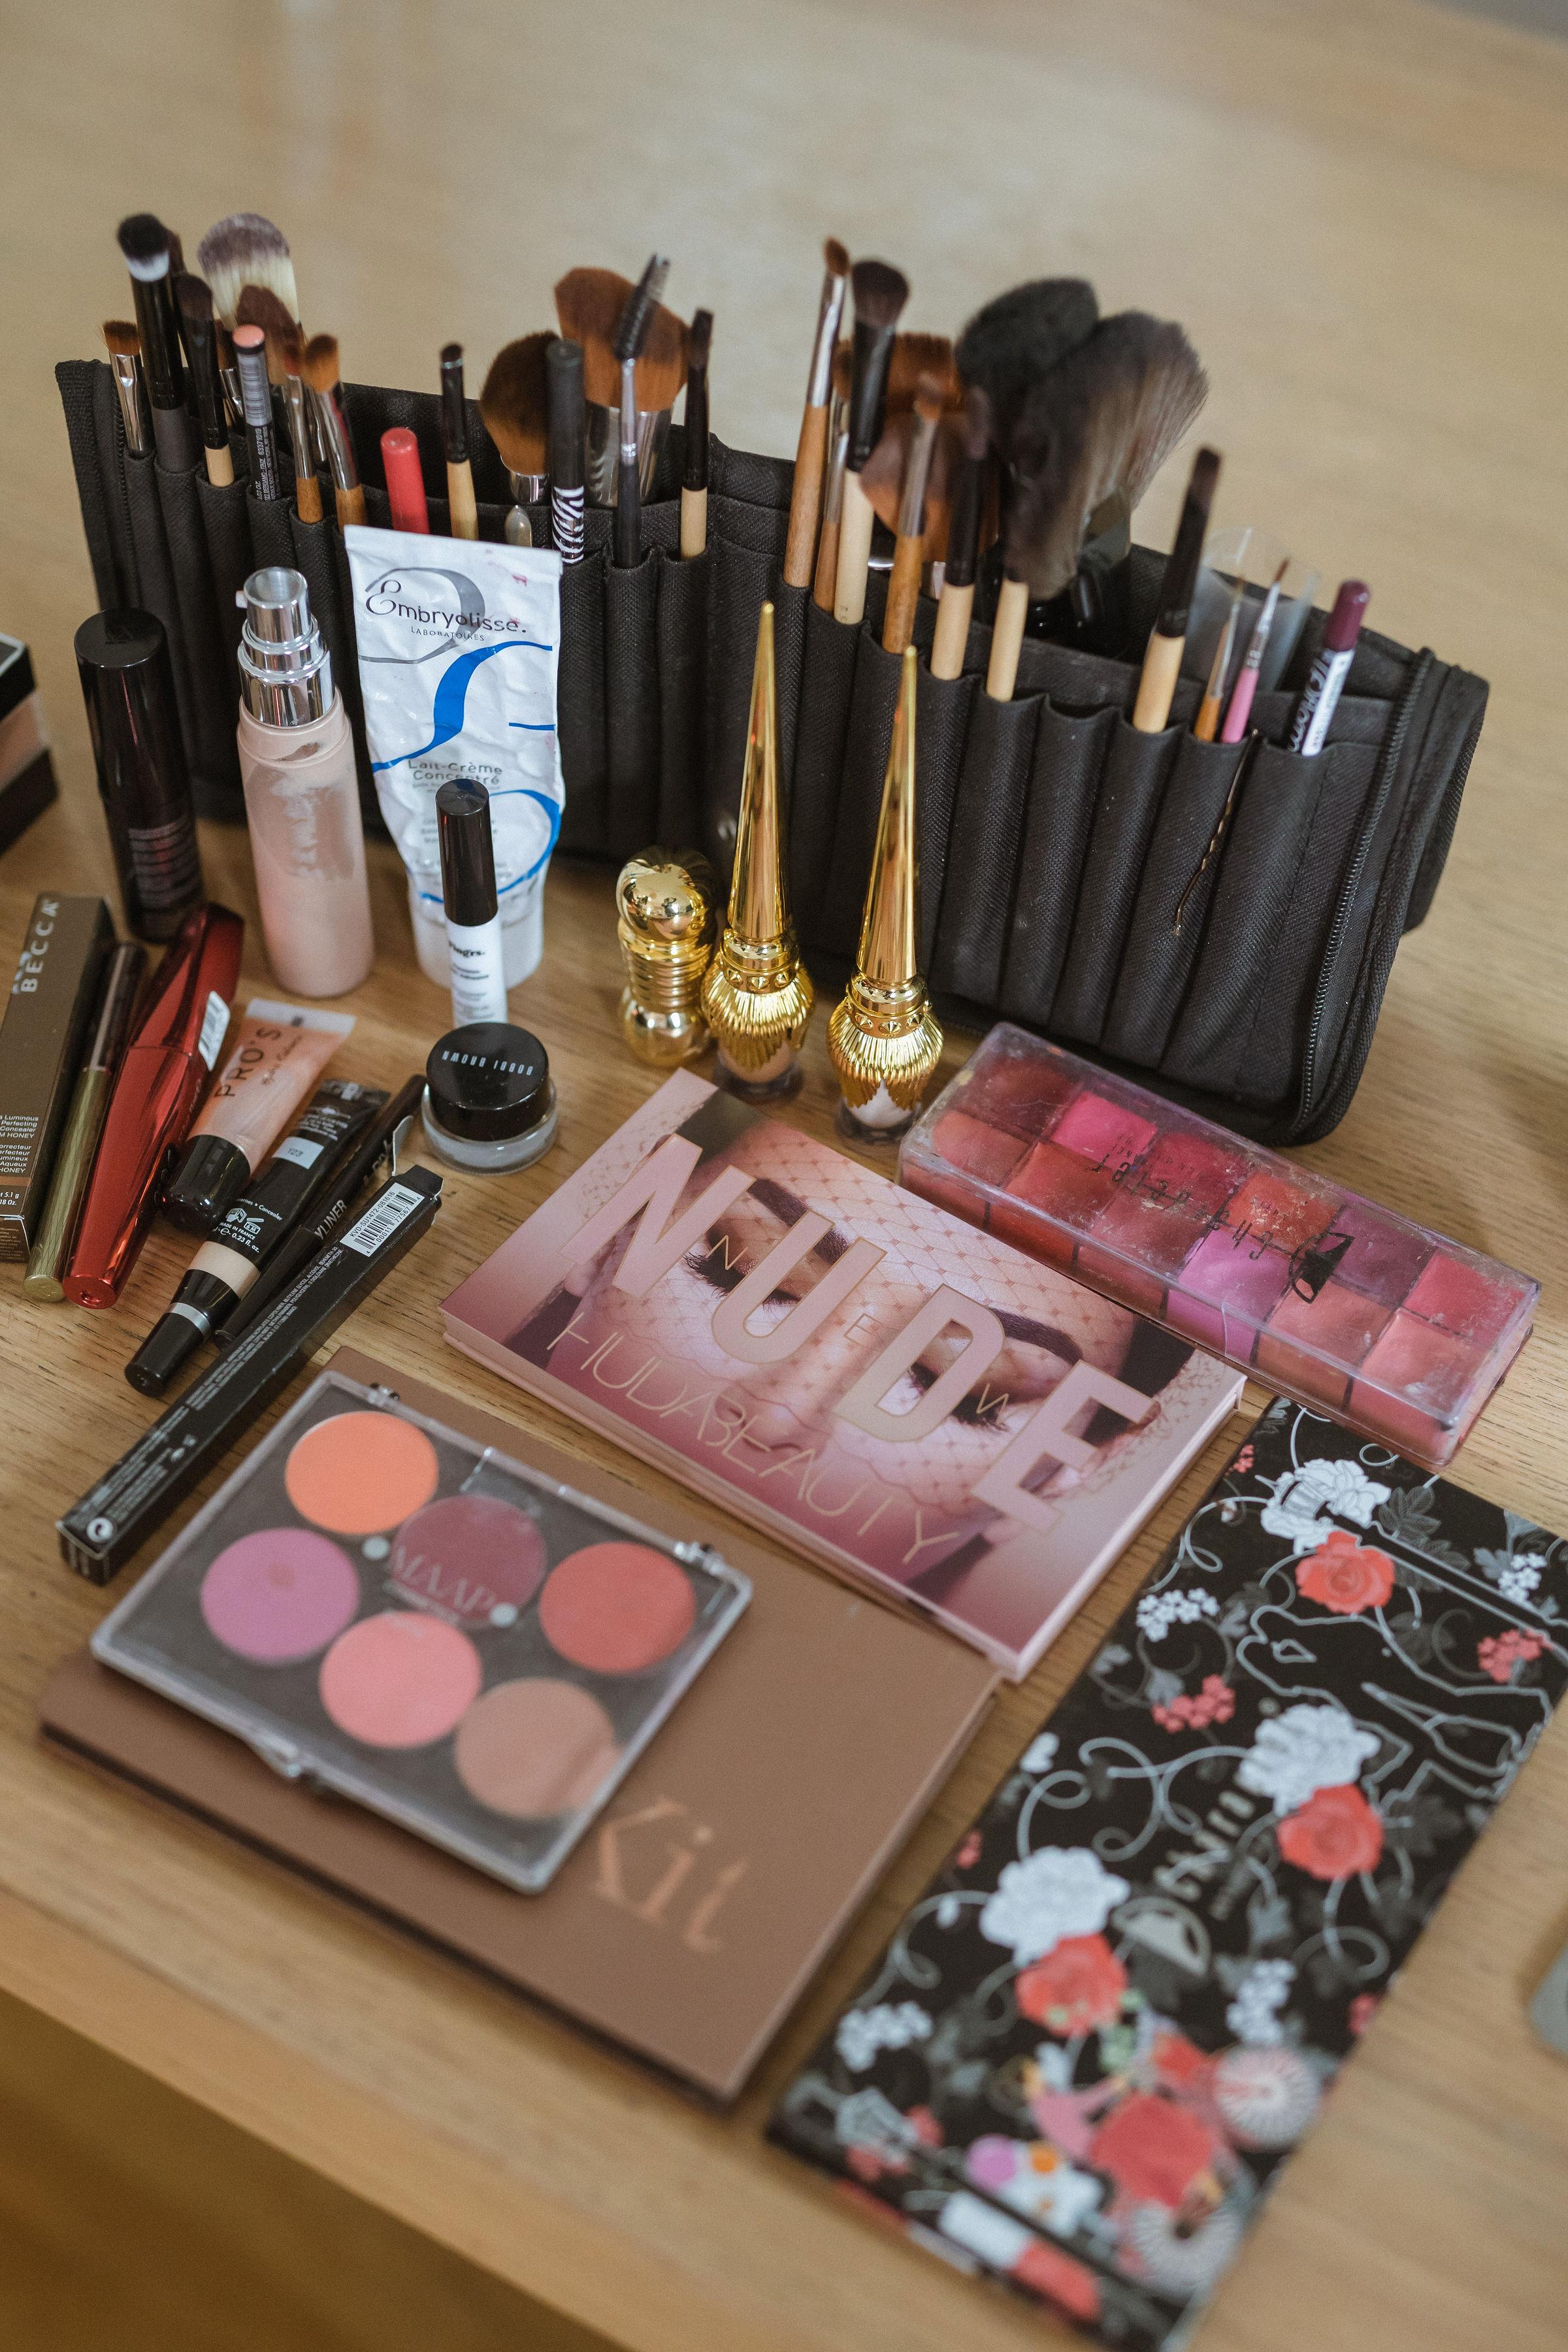 Parisian Makeup Artist Station by Iheartparisfr.jpg